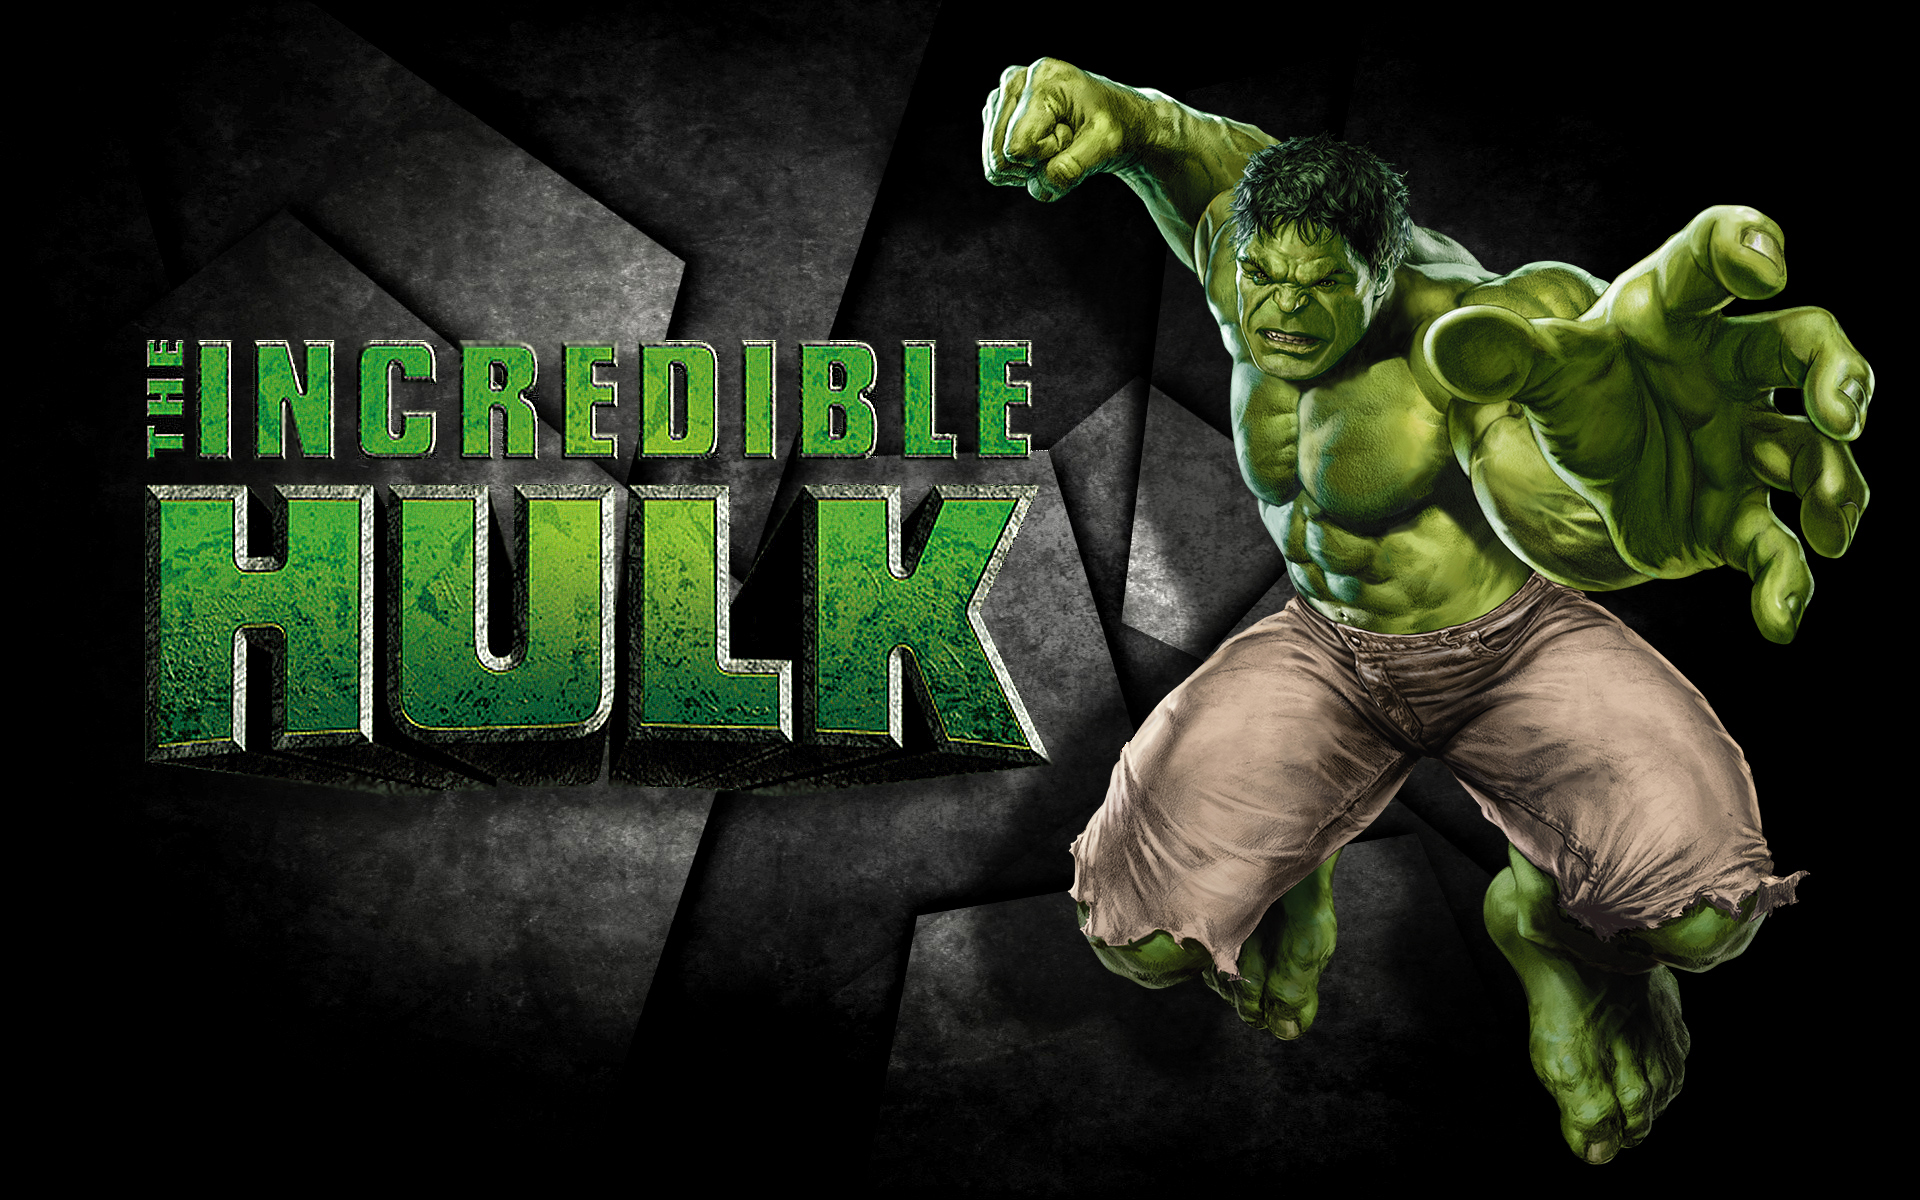 Incredible Hulk Marvel Avenger Superhero Pc Background Hd Wallpaper